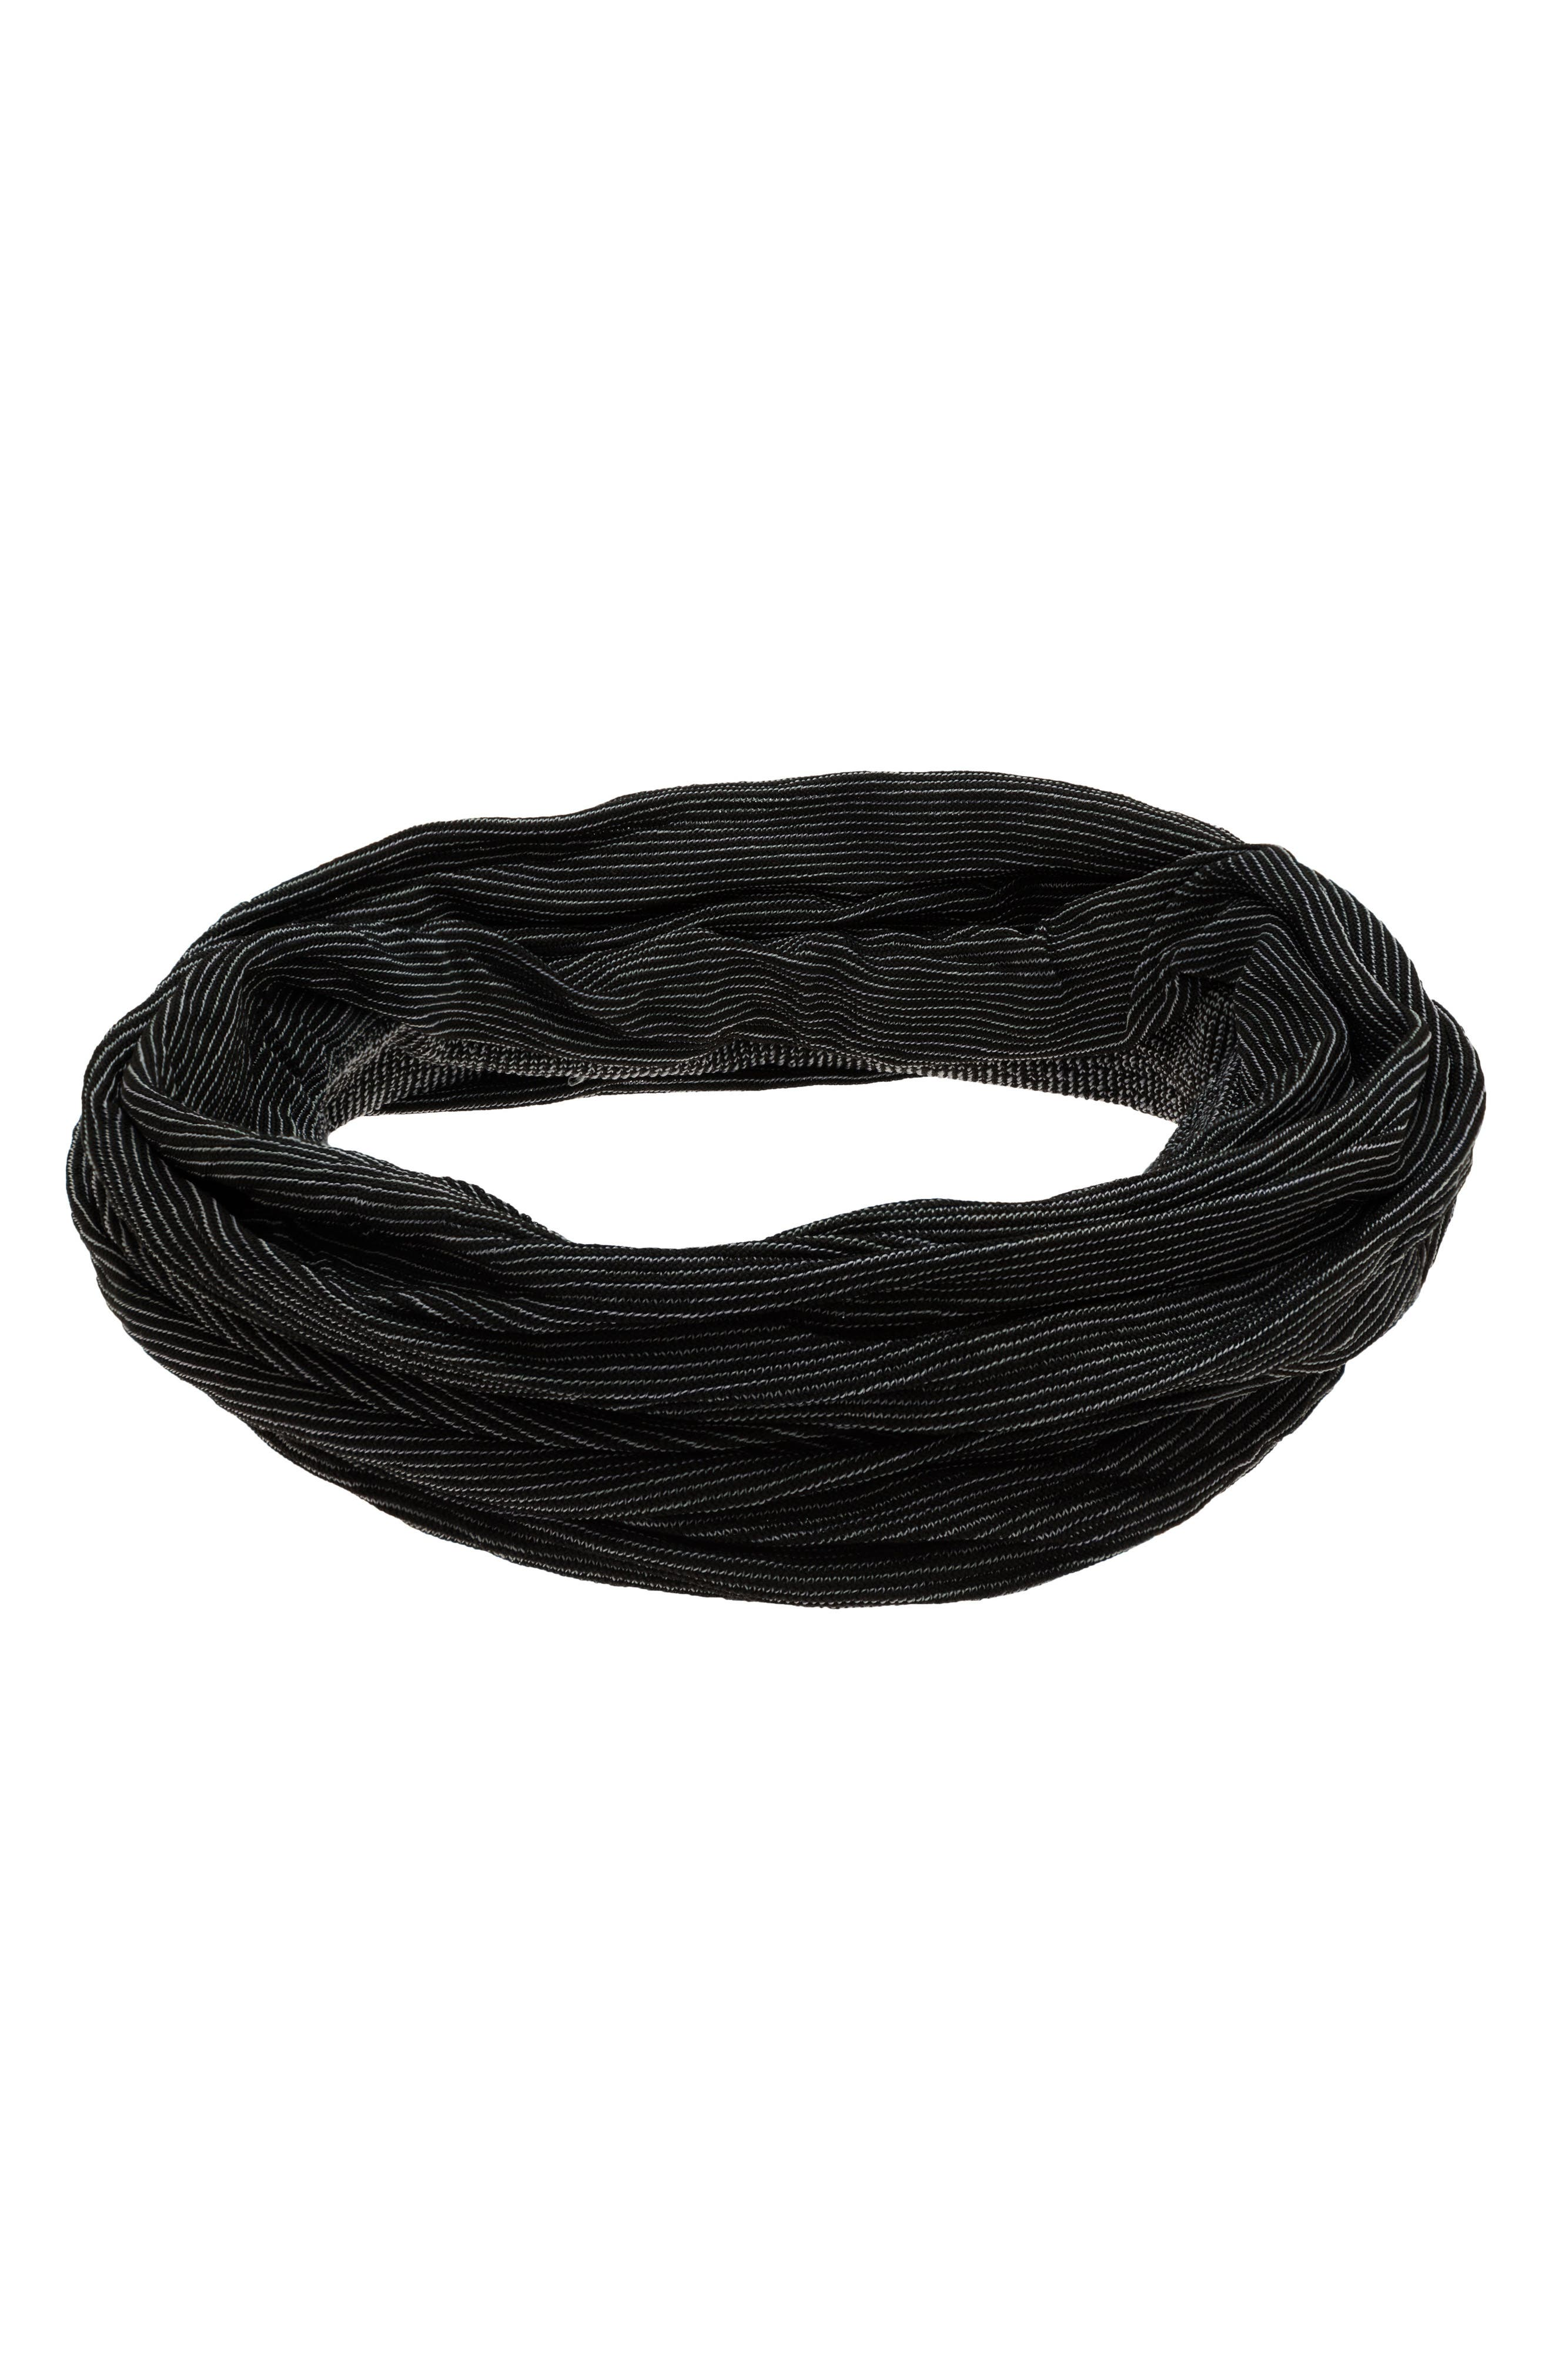 Space Dye Relaxed Turban Head Wrap,                             Alternate thumbnail 2, color,                             001